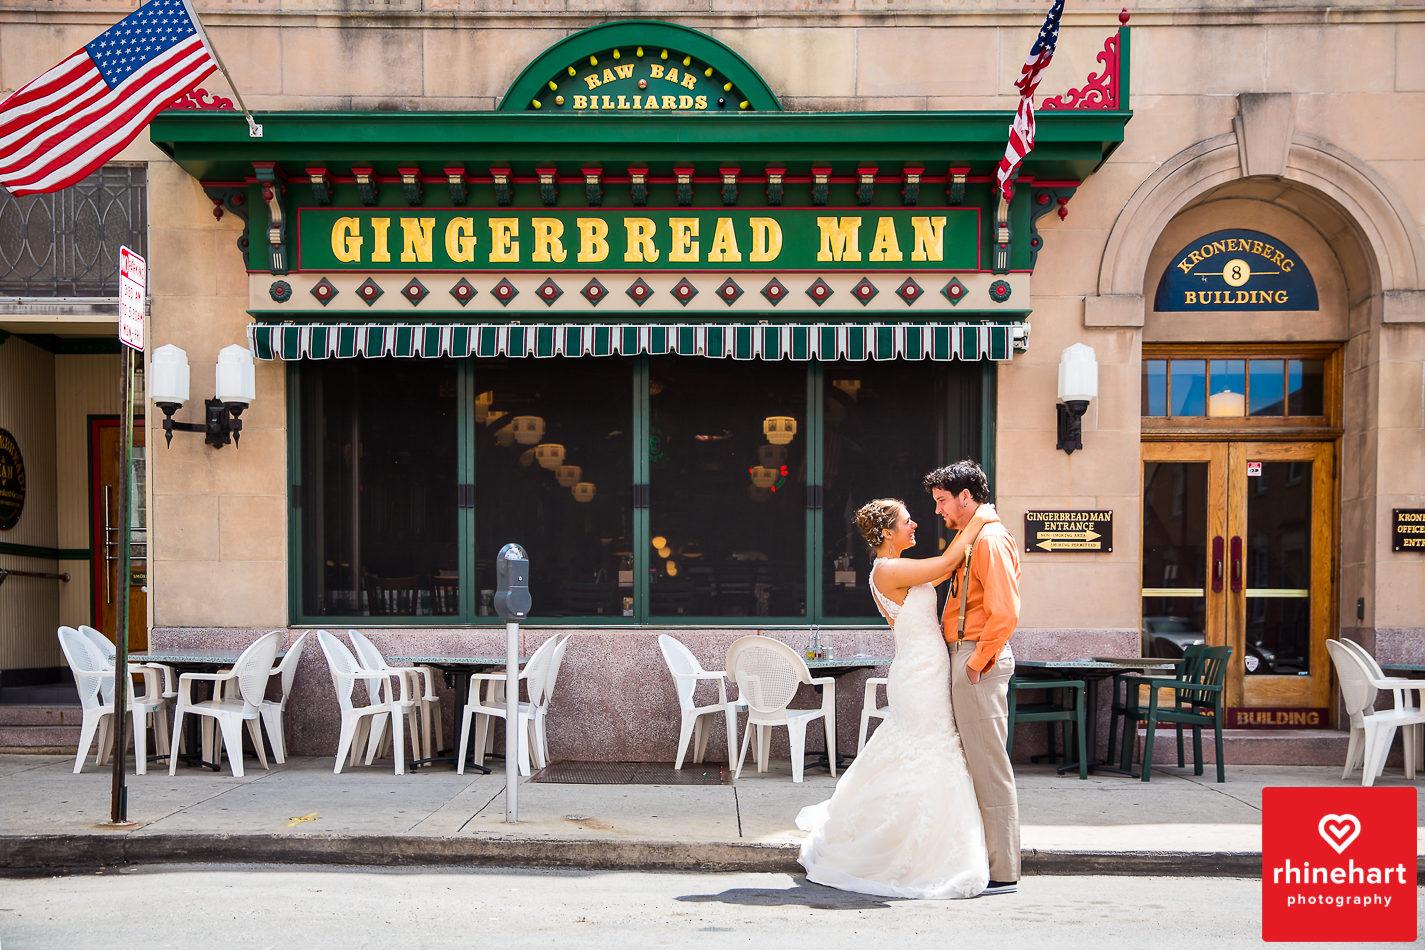 carlisle-ribbon-mill-wedding-photographer-114